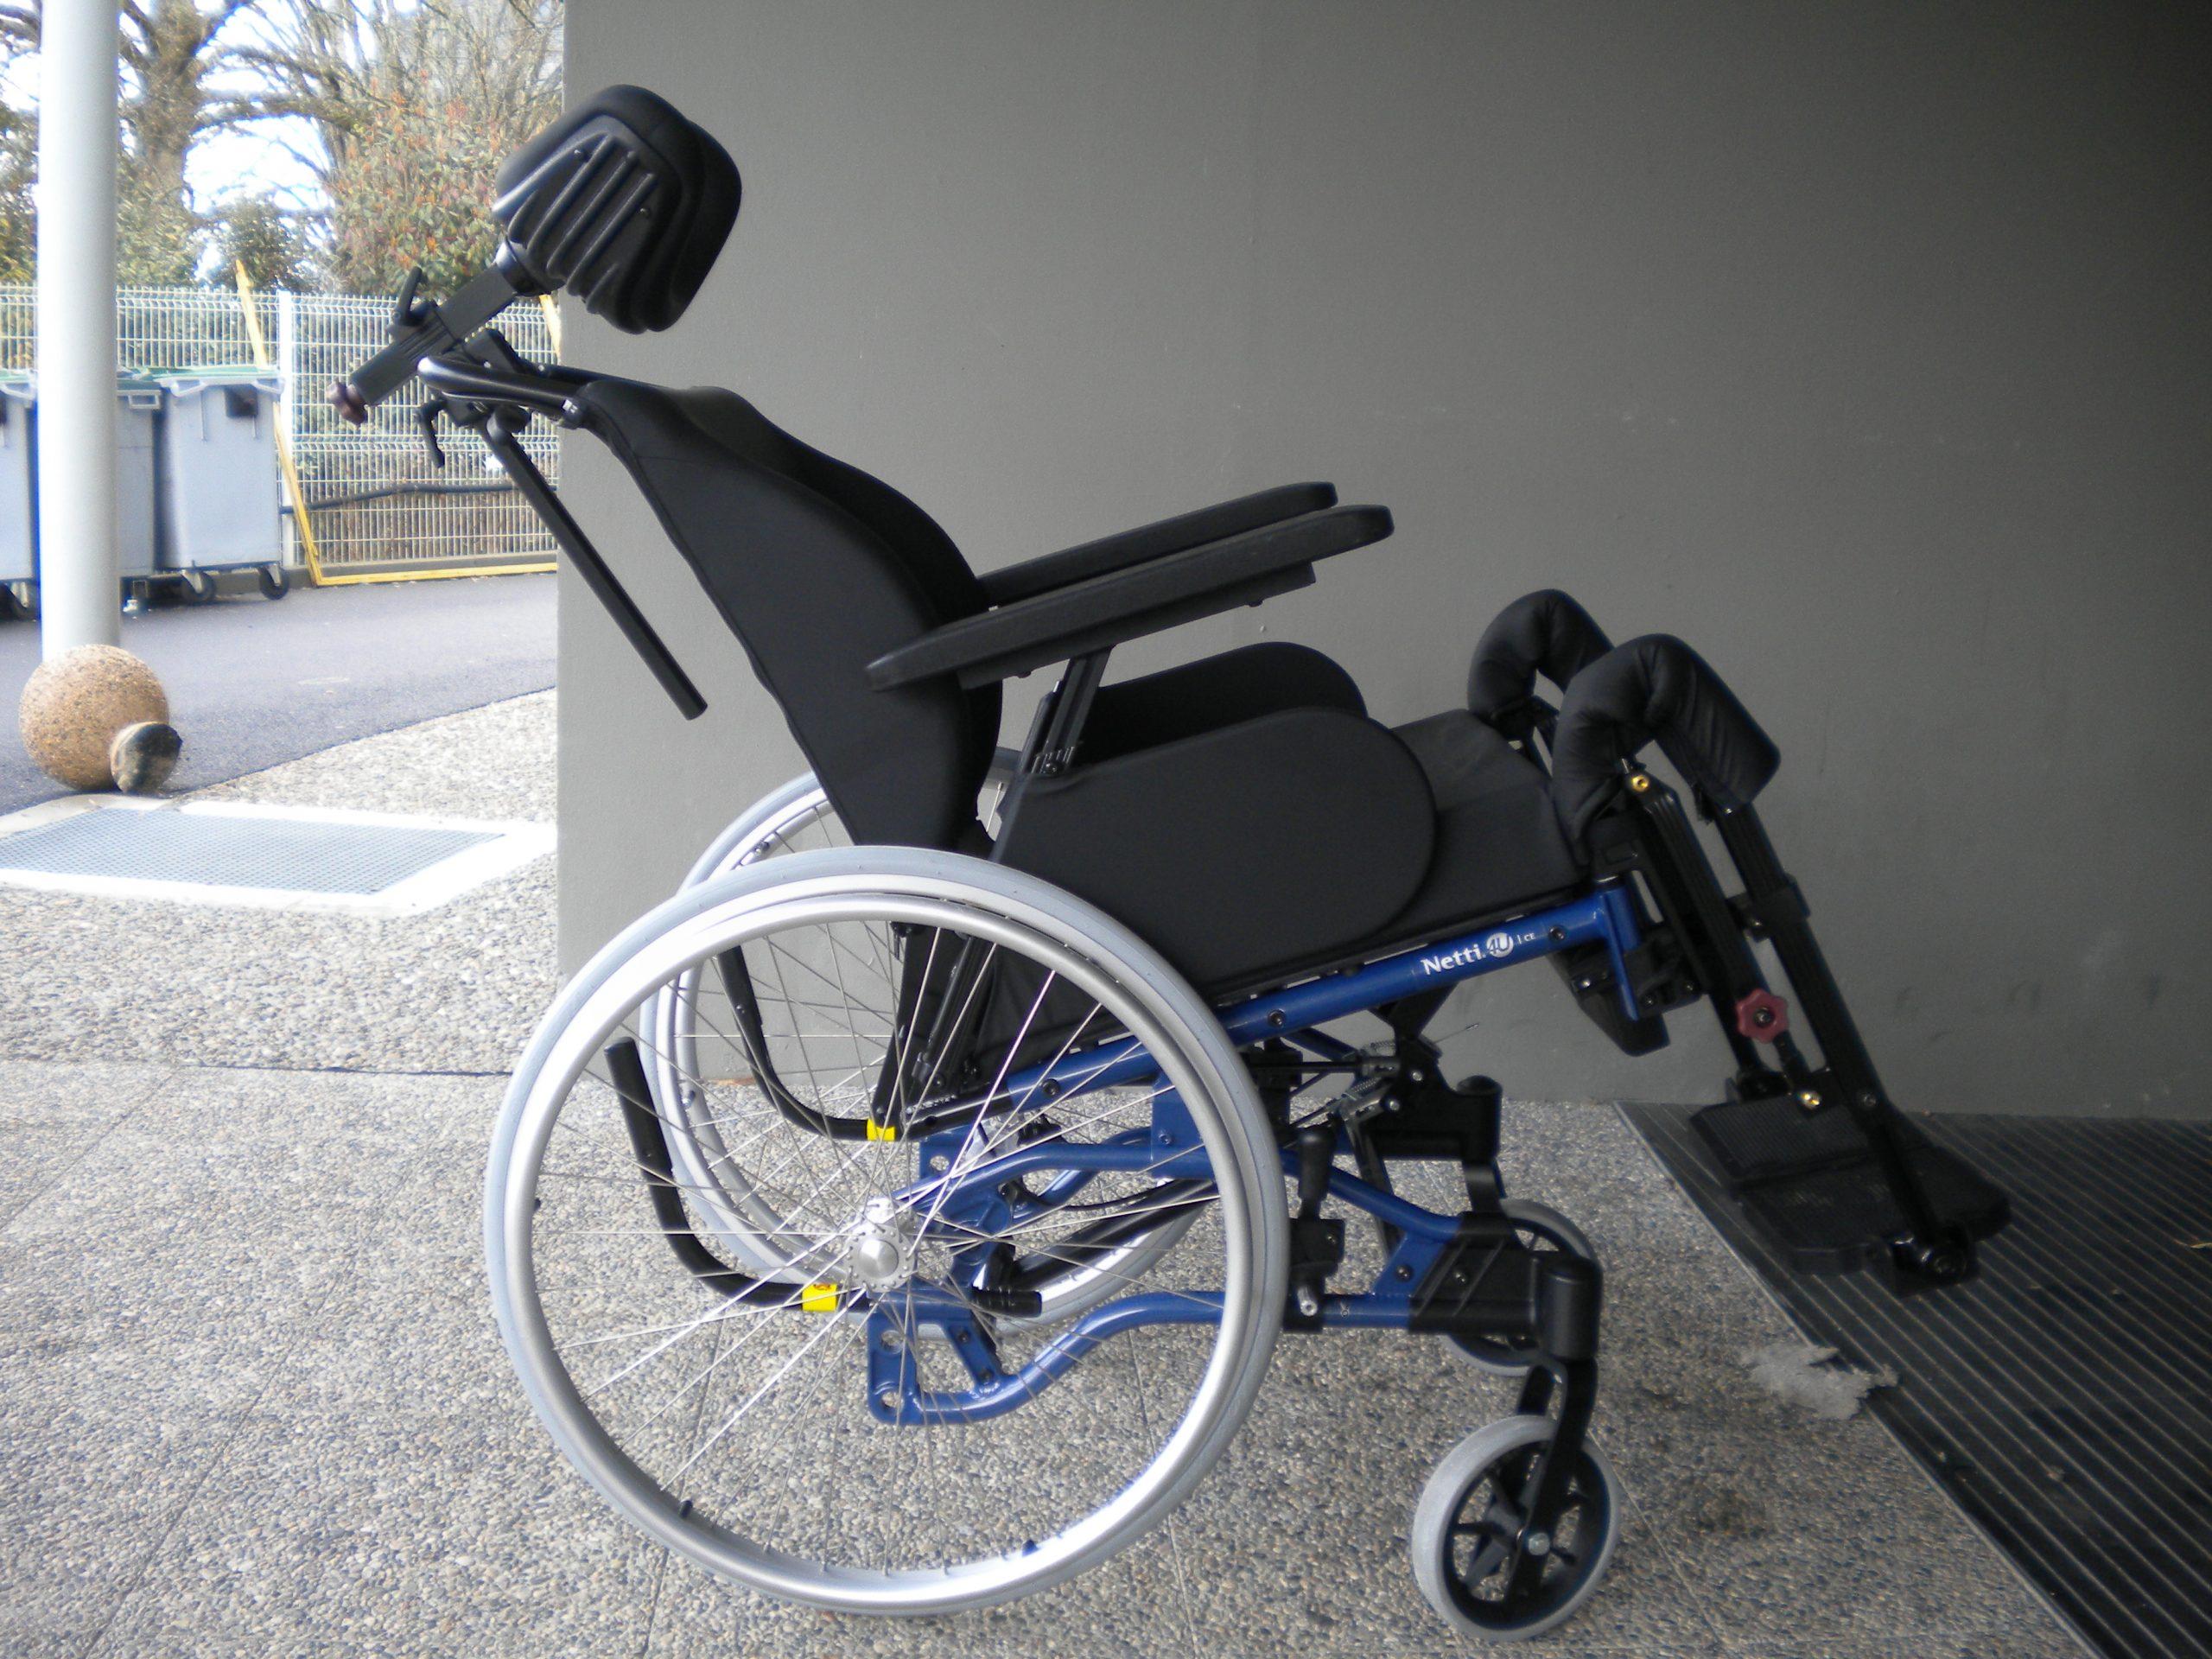 fauteuil roulant confort Netti